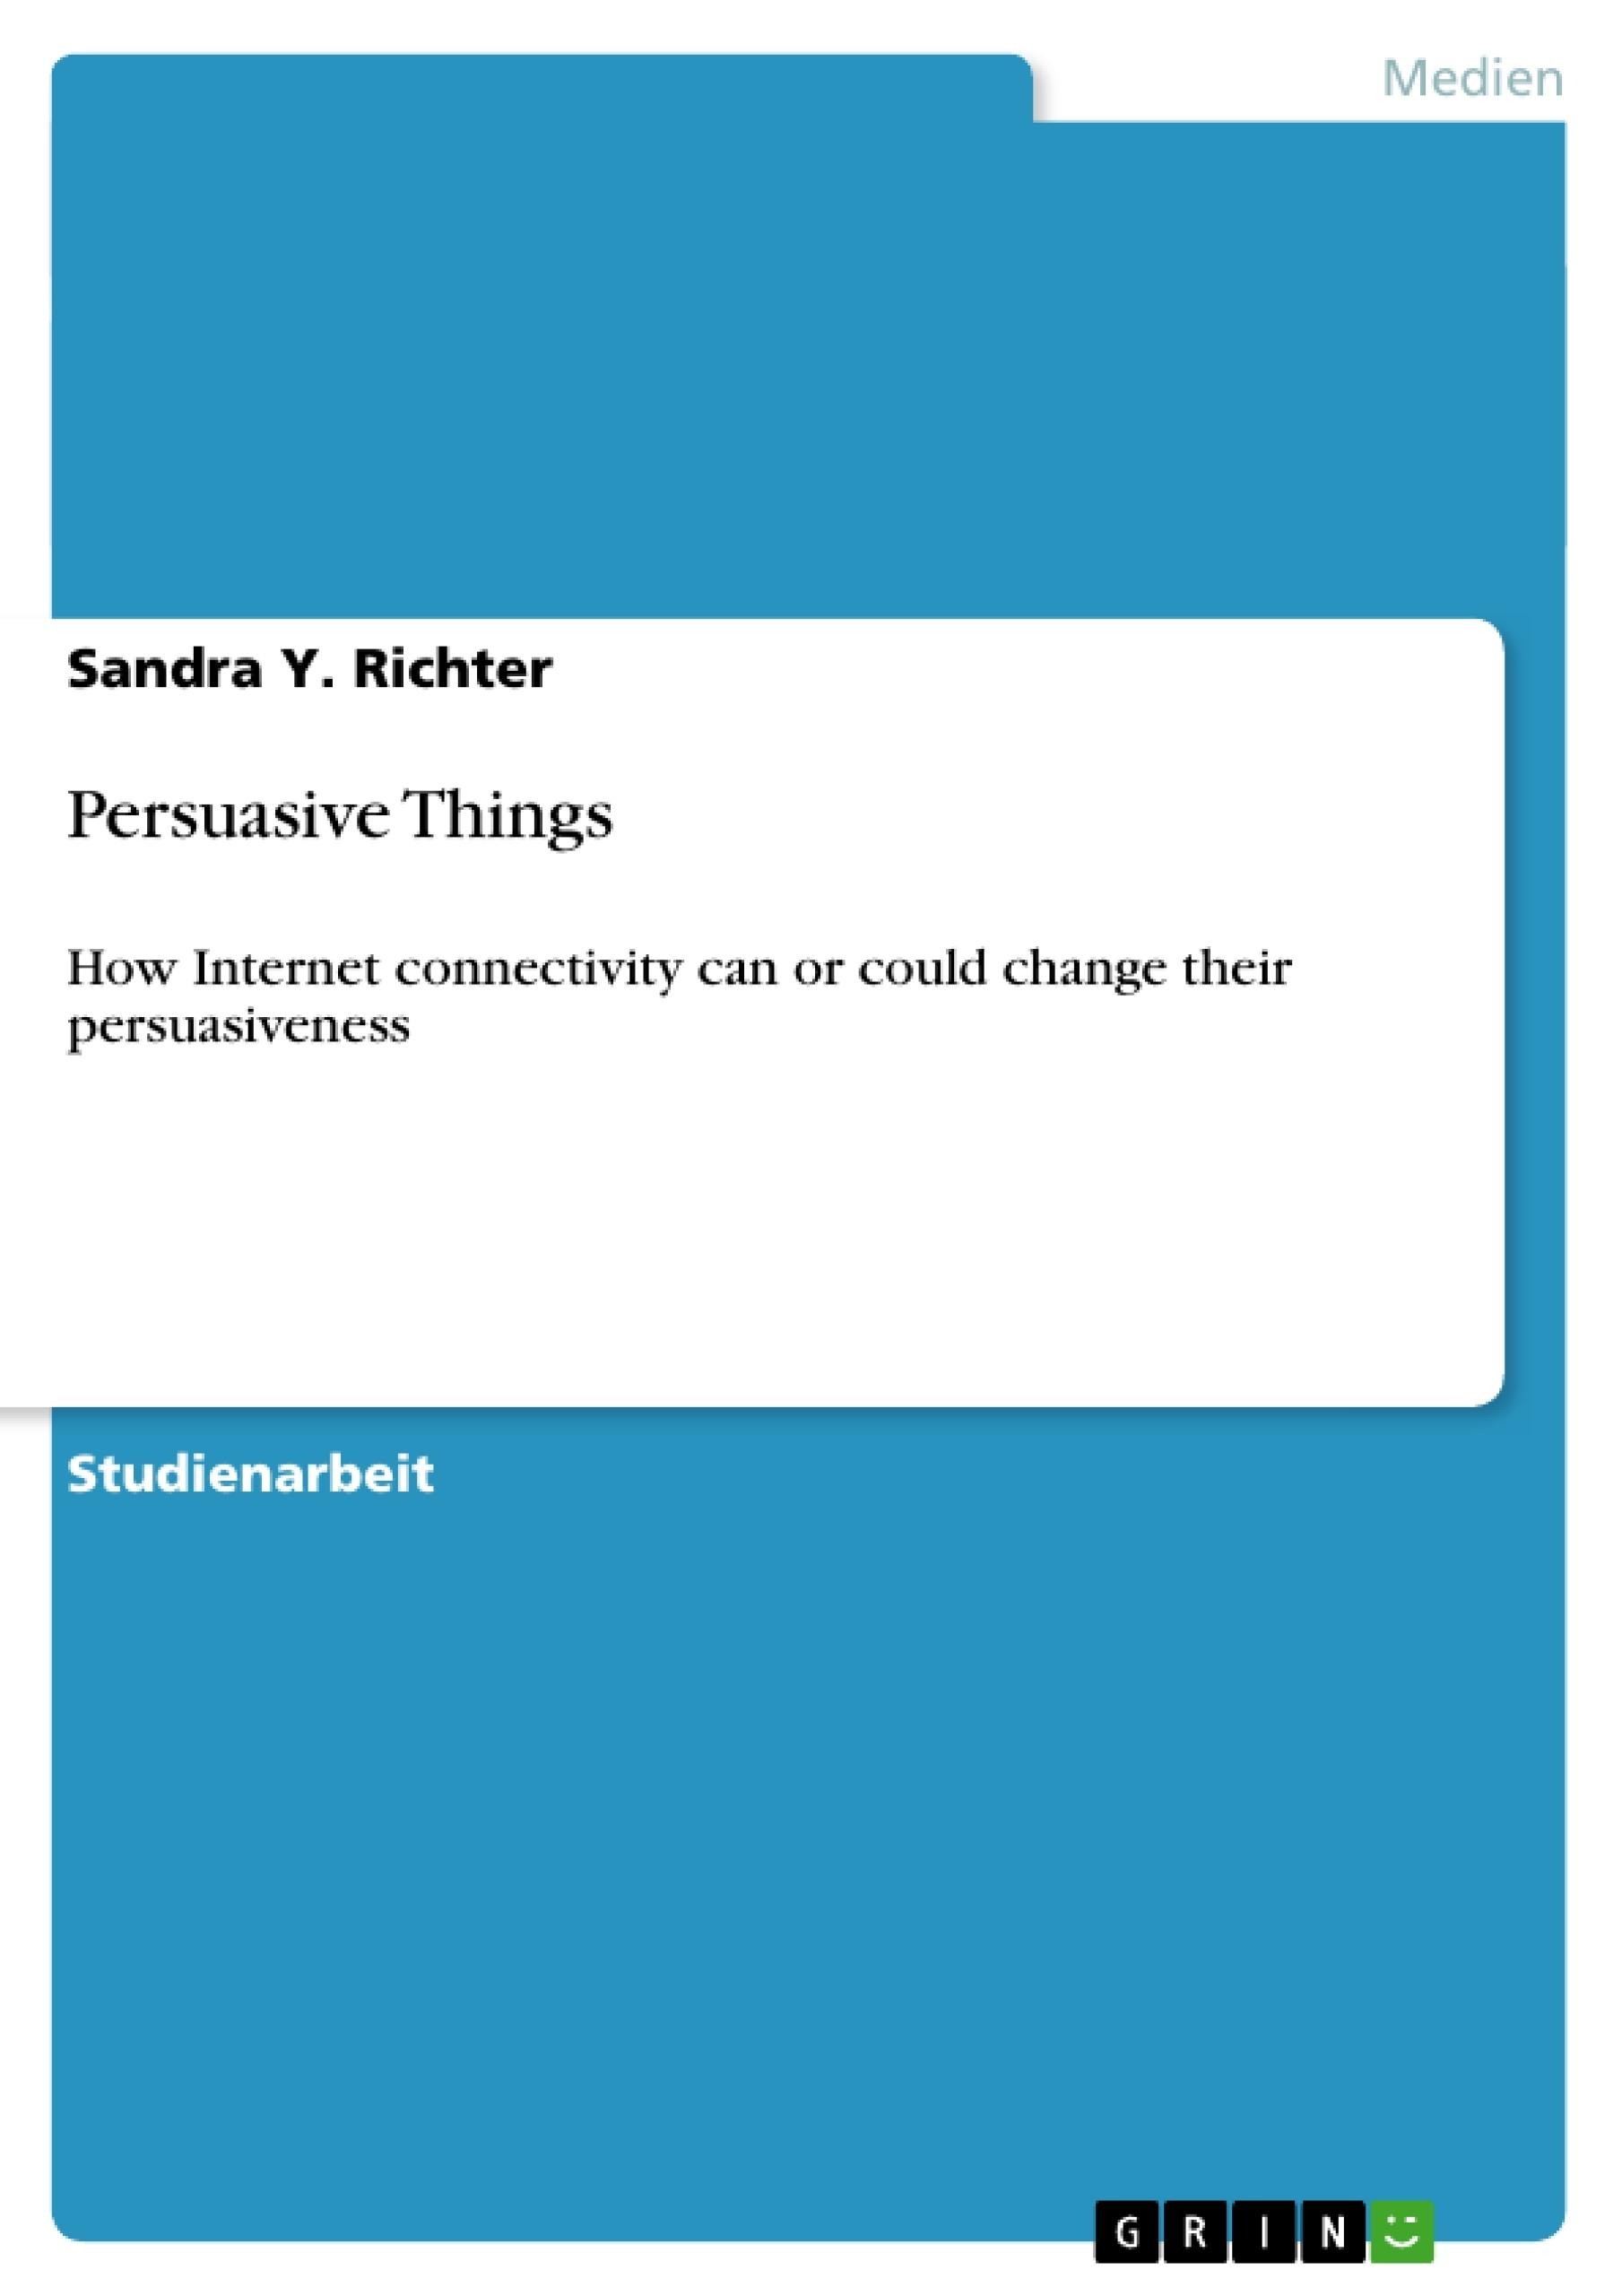 Titel: Persuasive Things